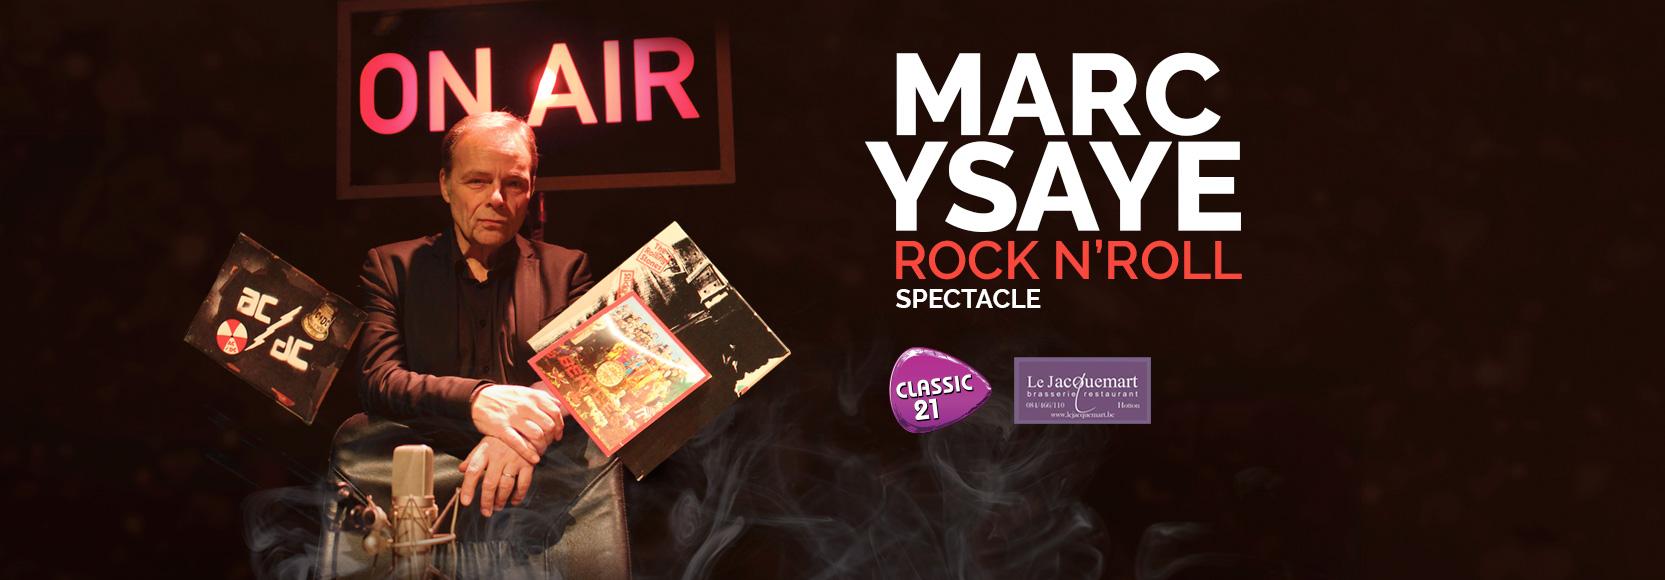 marc-ysaye_rock-nroll_spectacle_banner_web.jpg